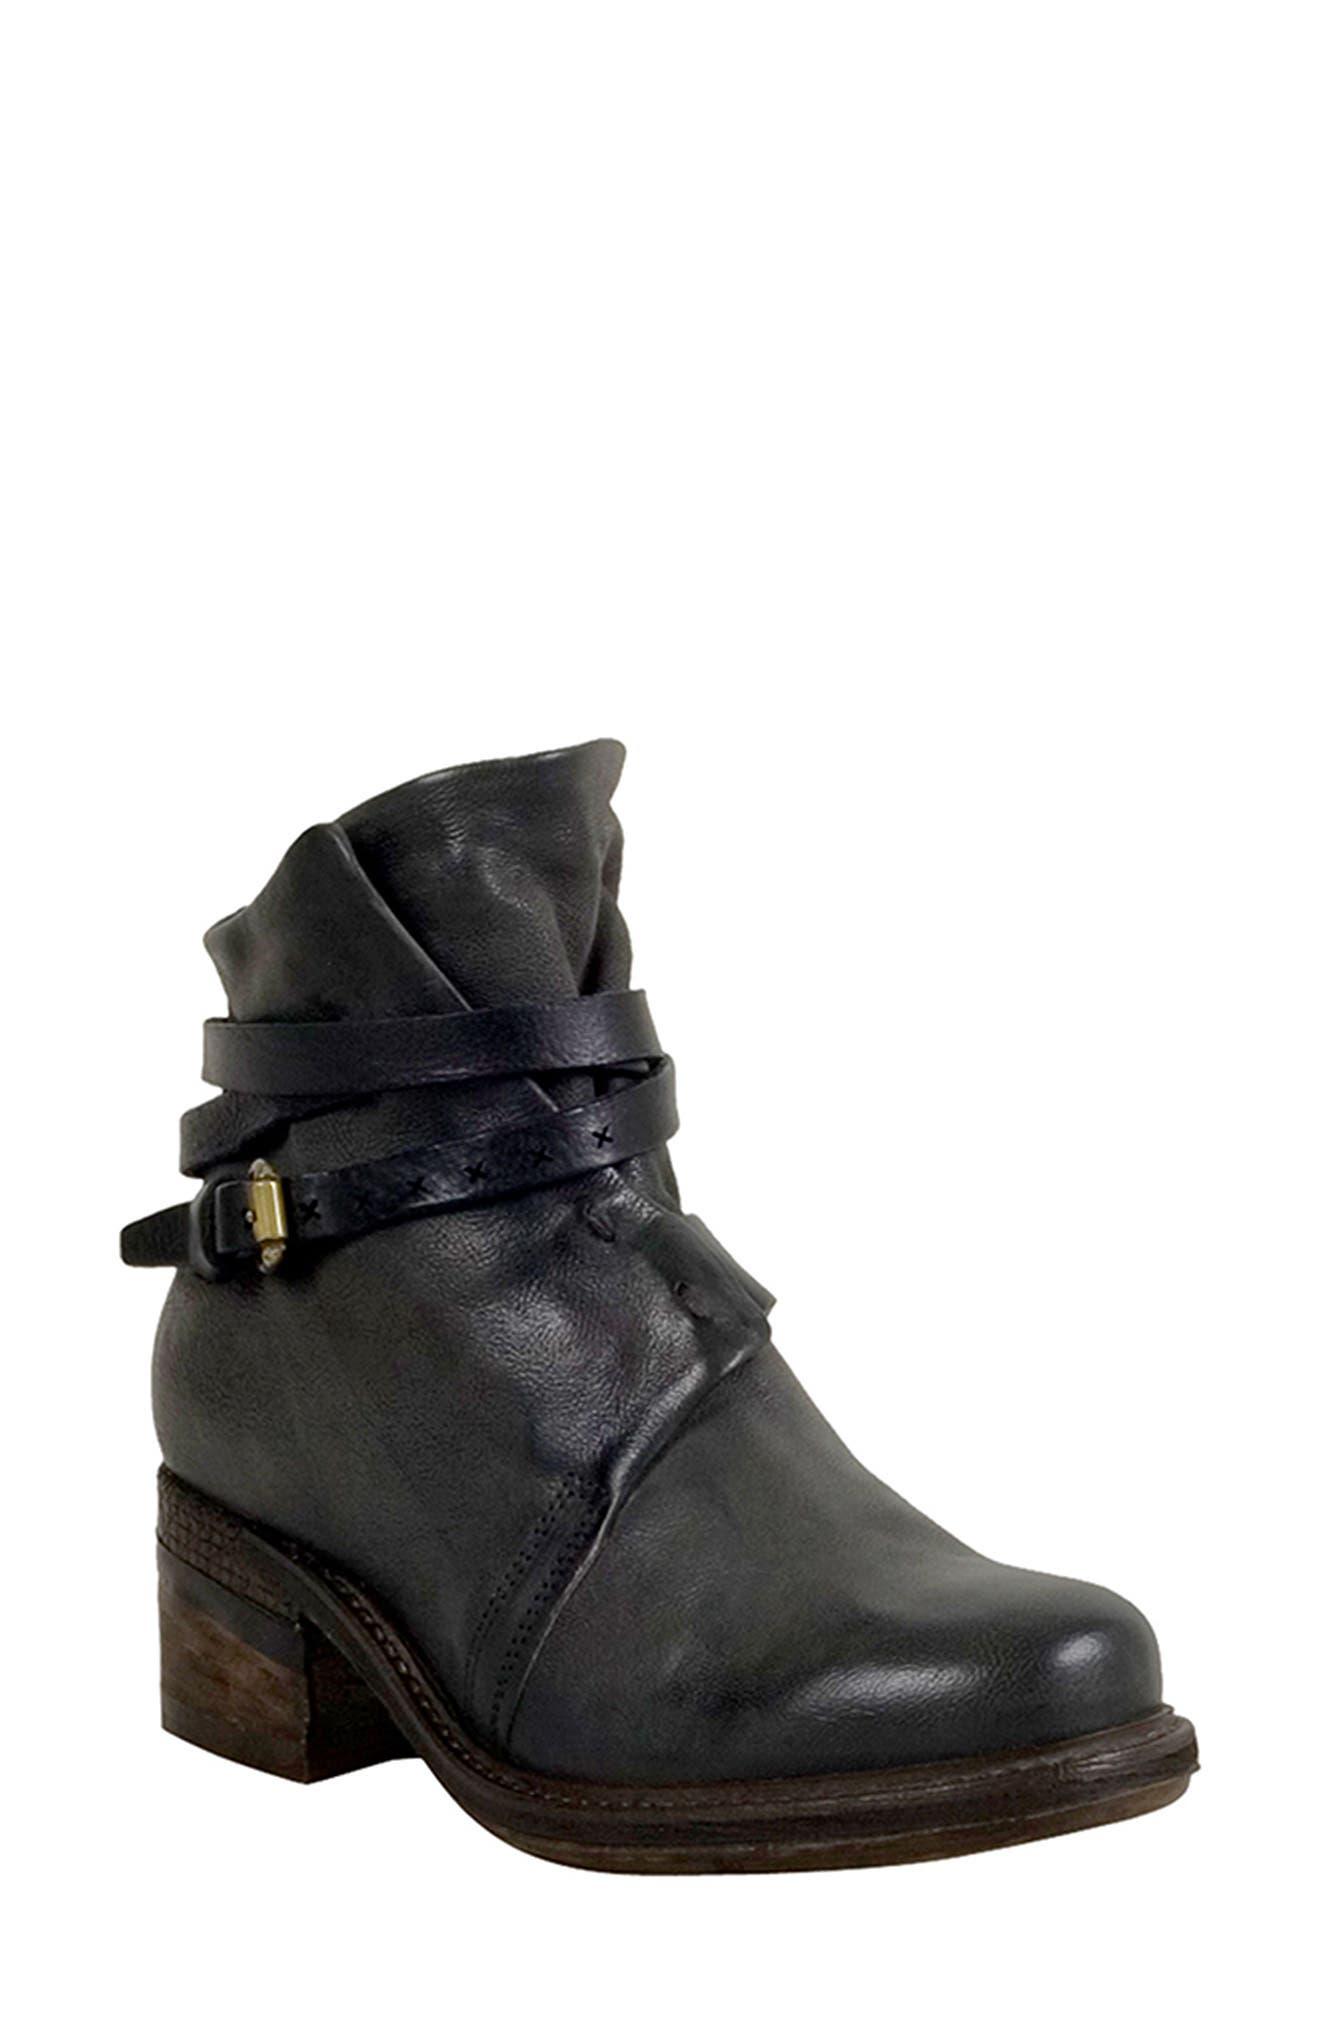 Main Image - A.S. 98 Norman Boot (Women)